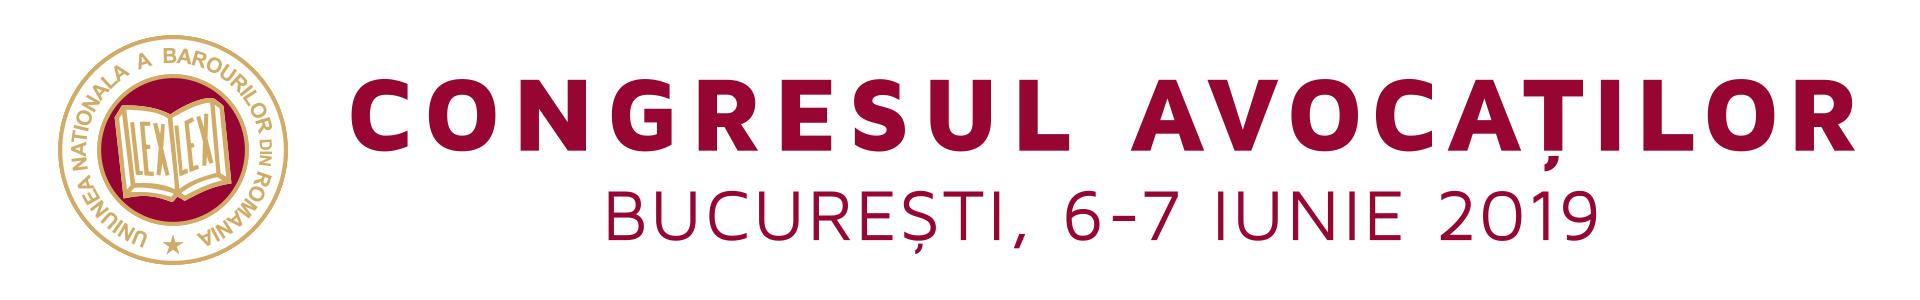 UNBR Congres Bucuresti 2019 banner 1920x300 px